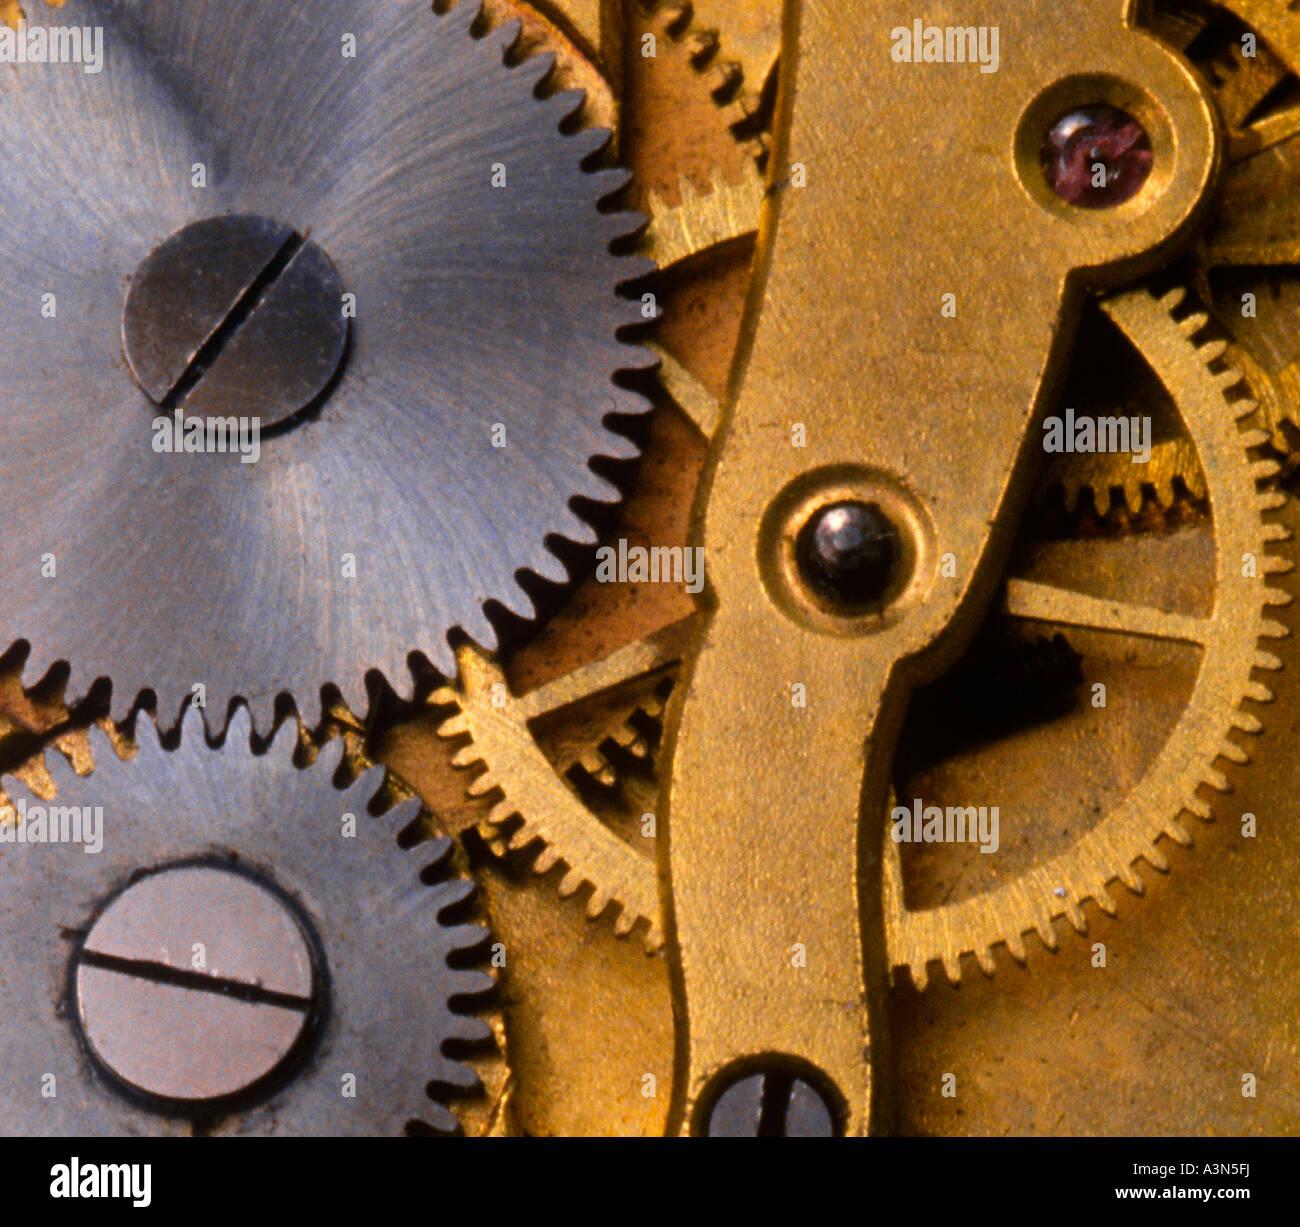 Clock Interior Gears Detail Close-up Working Mechanical Parts Sandra Baker - Stock Image